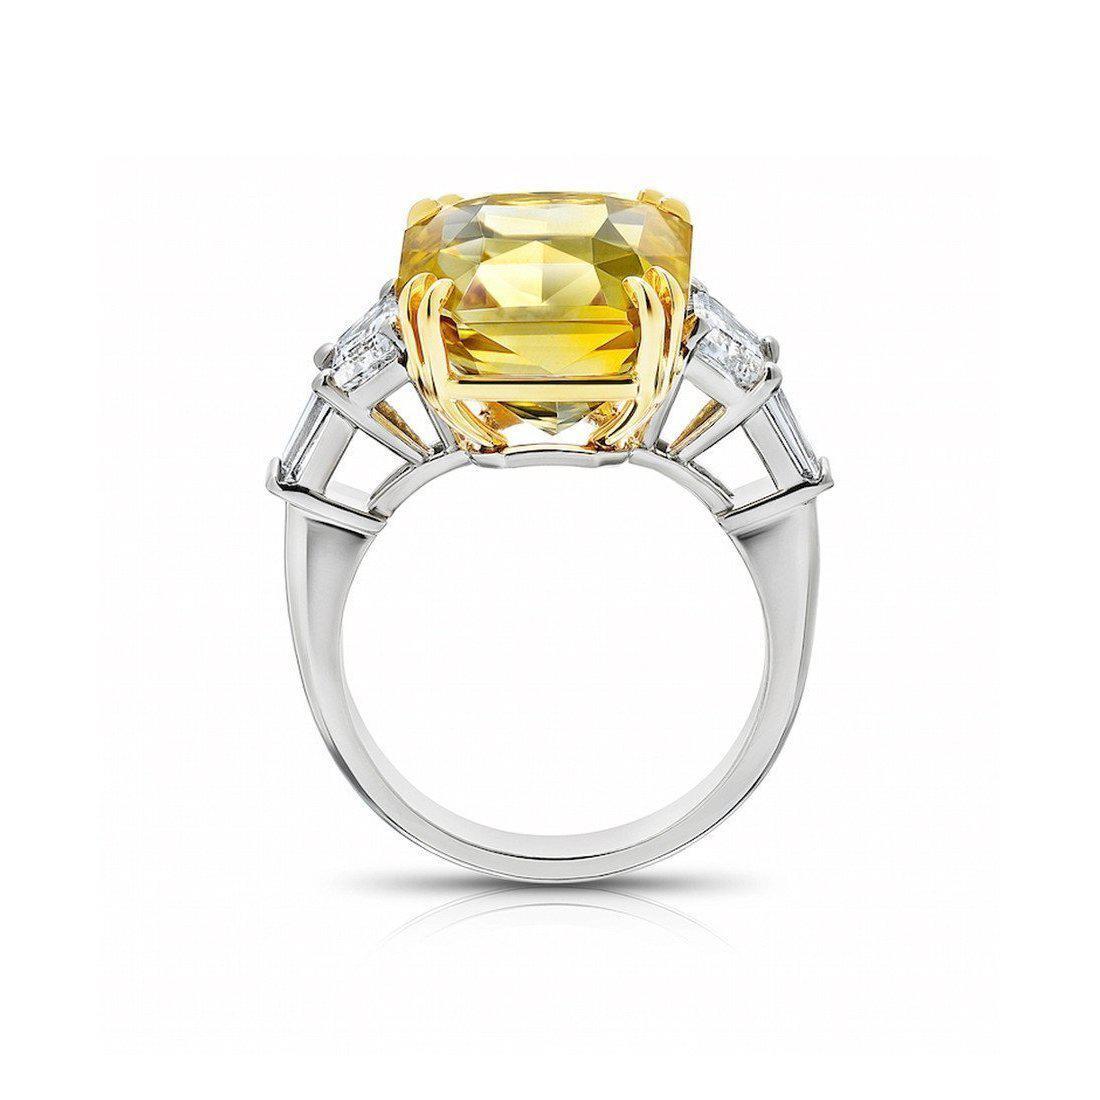 David Gross Radiant Yellow Sapphire Ring